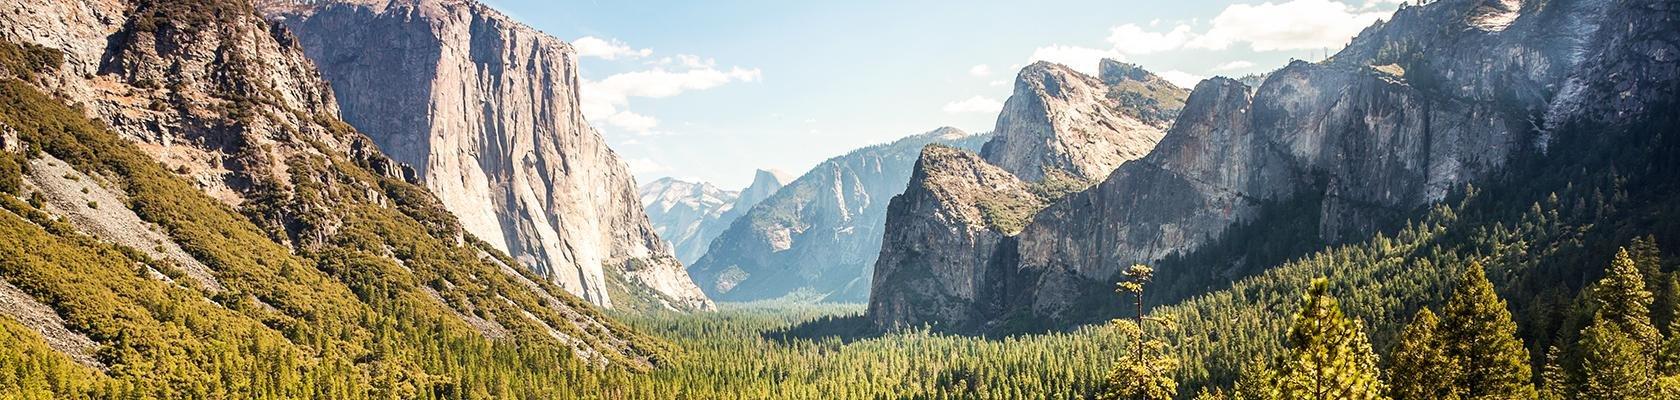 Yosemite Nationaal Park in Amerika